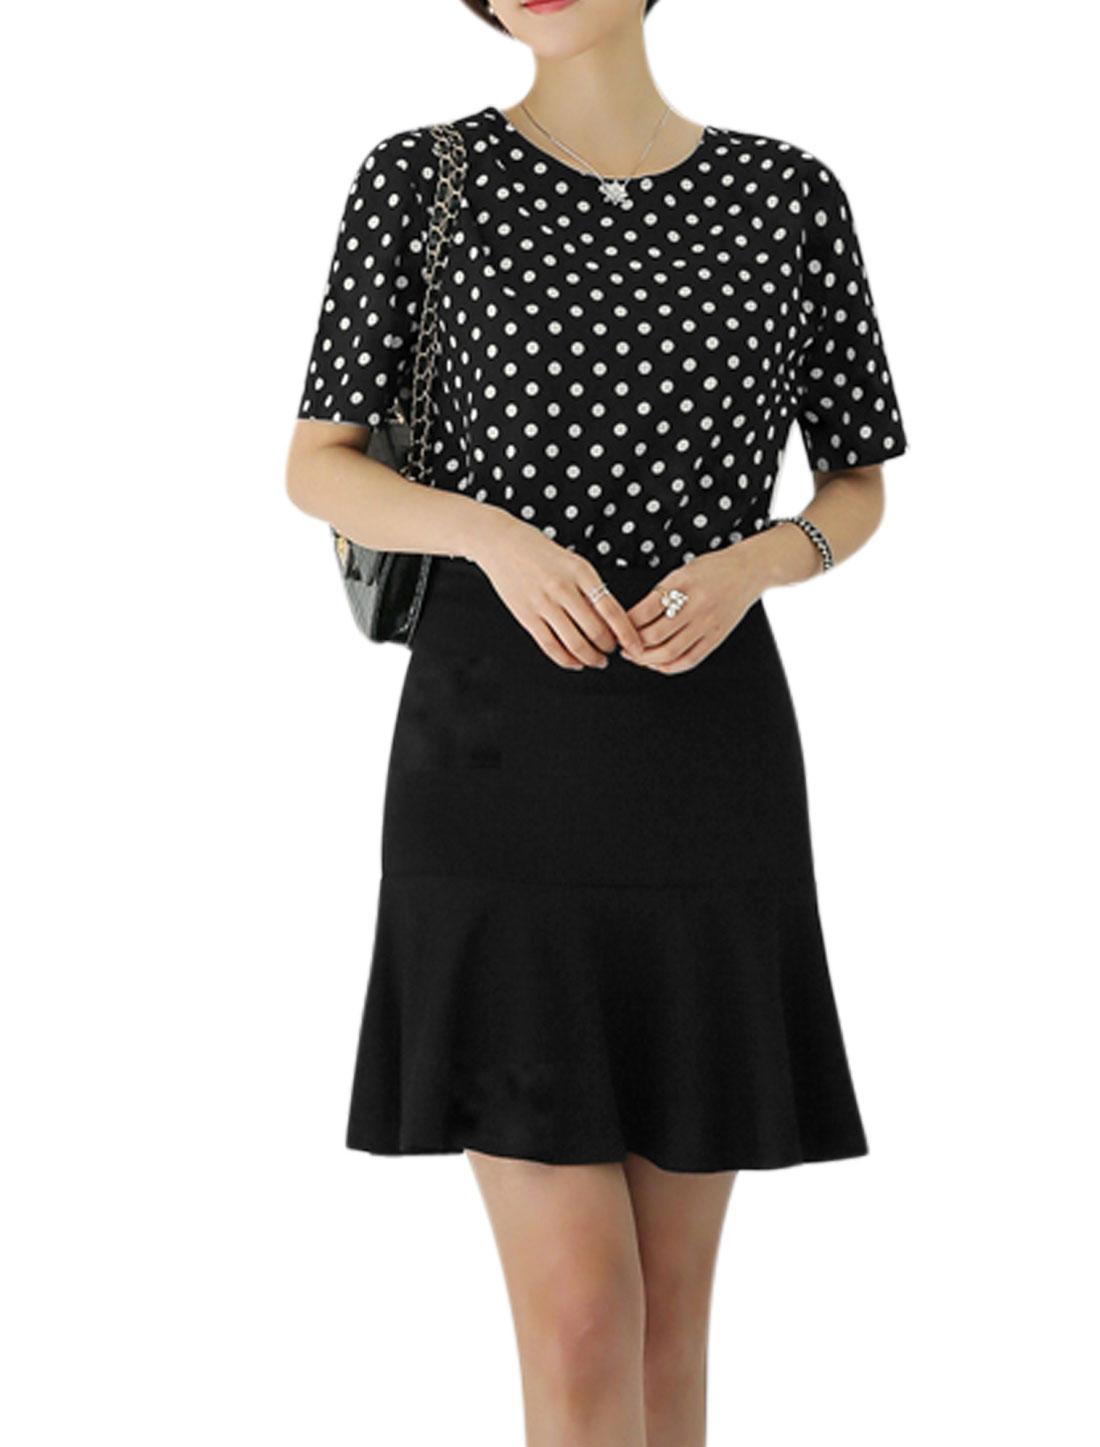 Women Polka Dots Prints Fully Lined Flouncing Hem Dress Black M